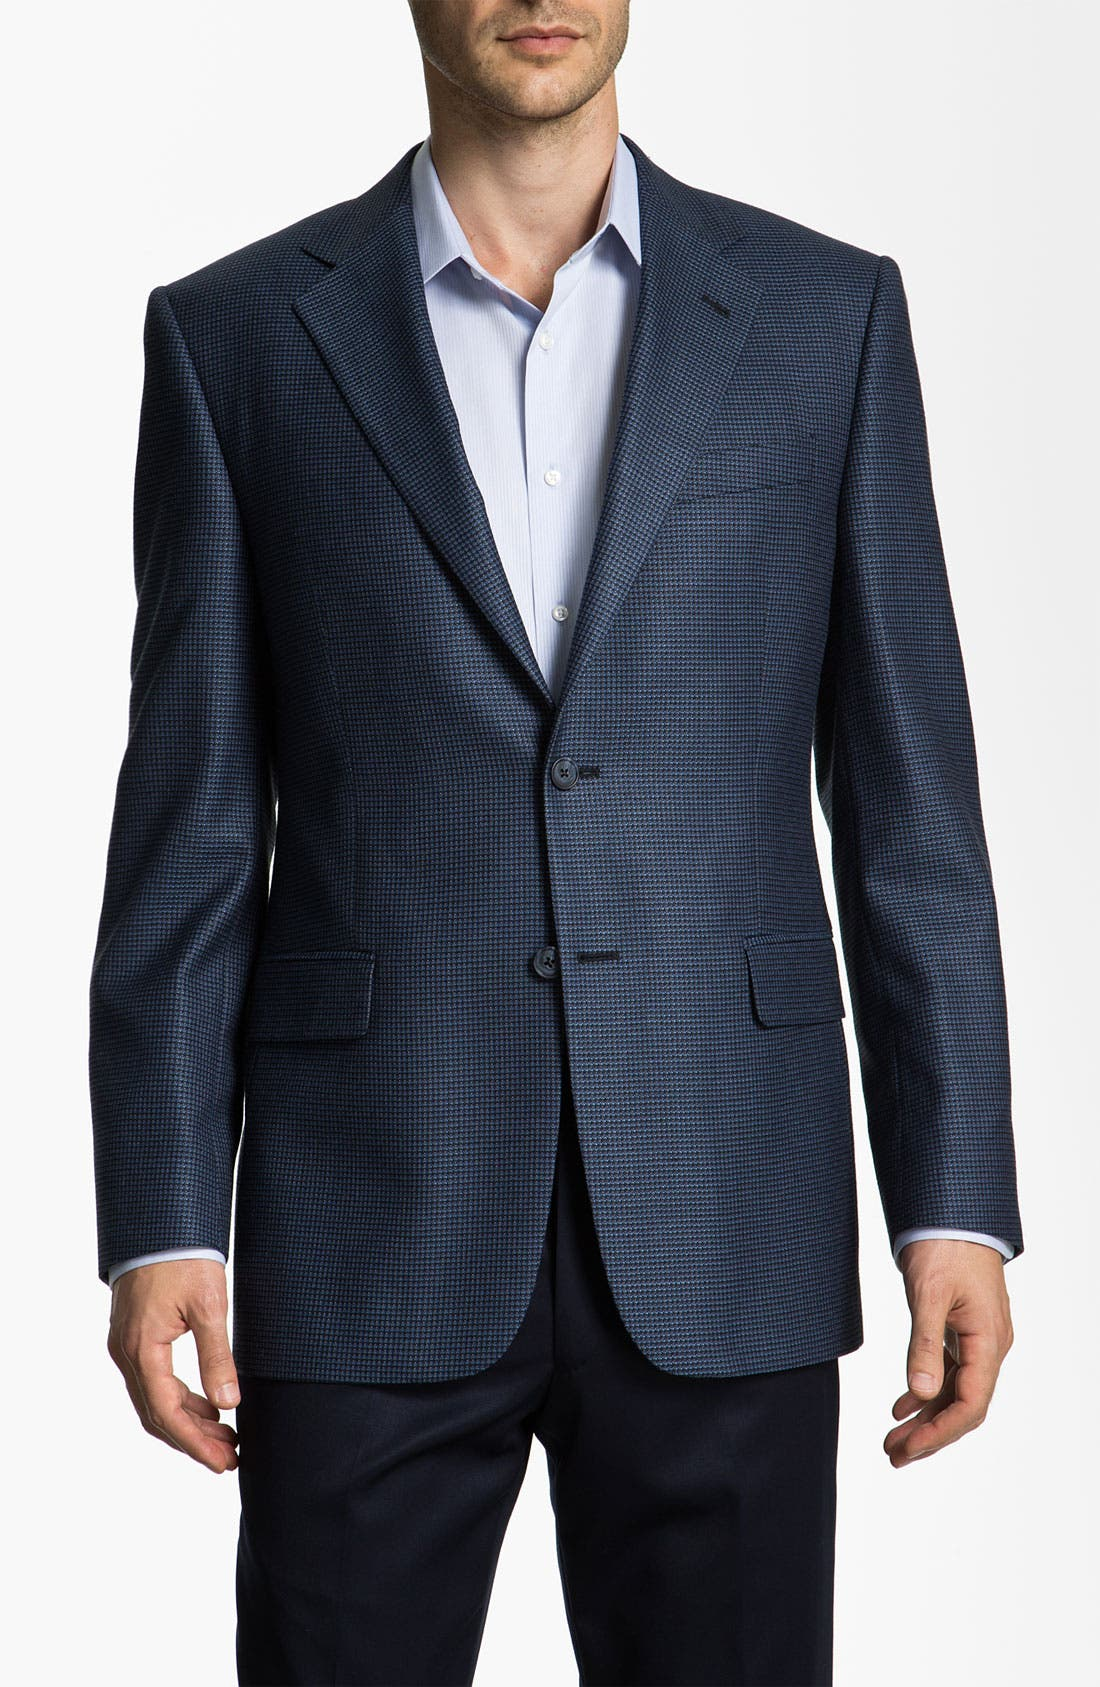 Alternate Image 1 Selected - Joseph Abboud 'Signature Silver' Sportcoat